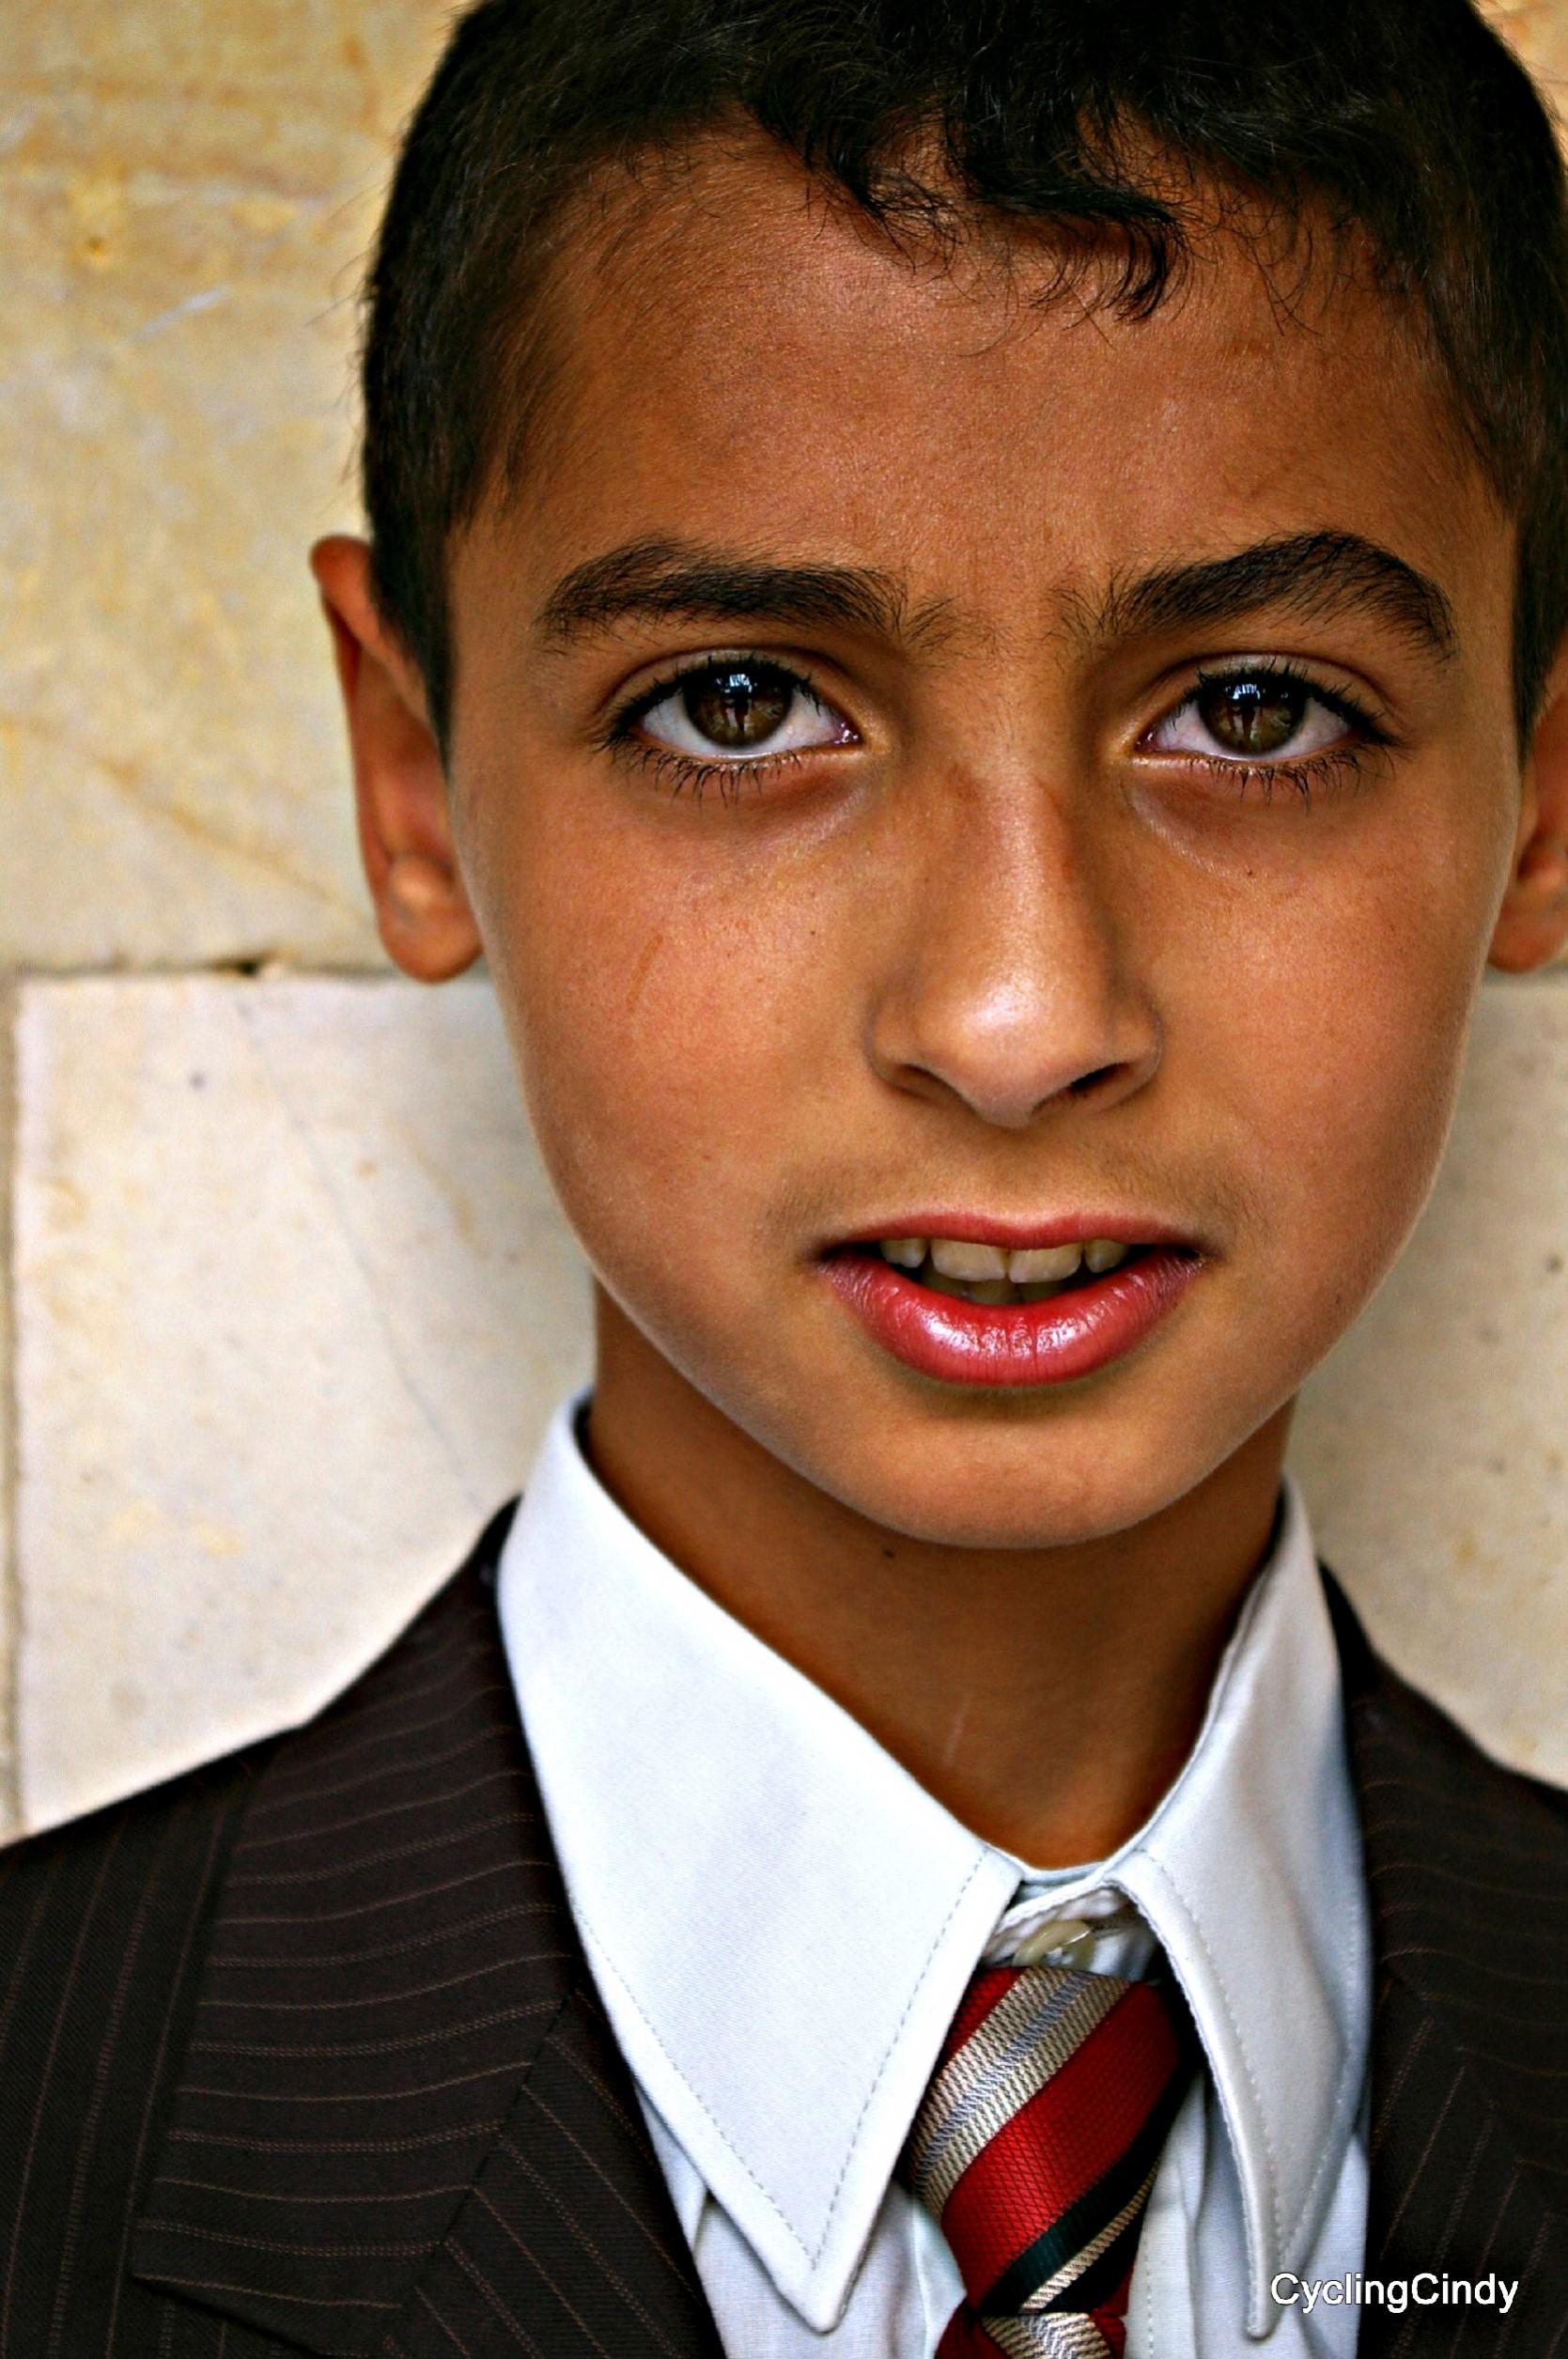 Eid, all children dressed in new